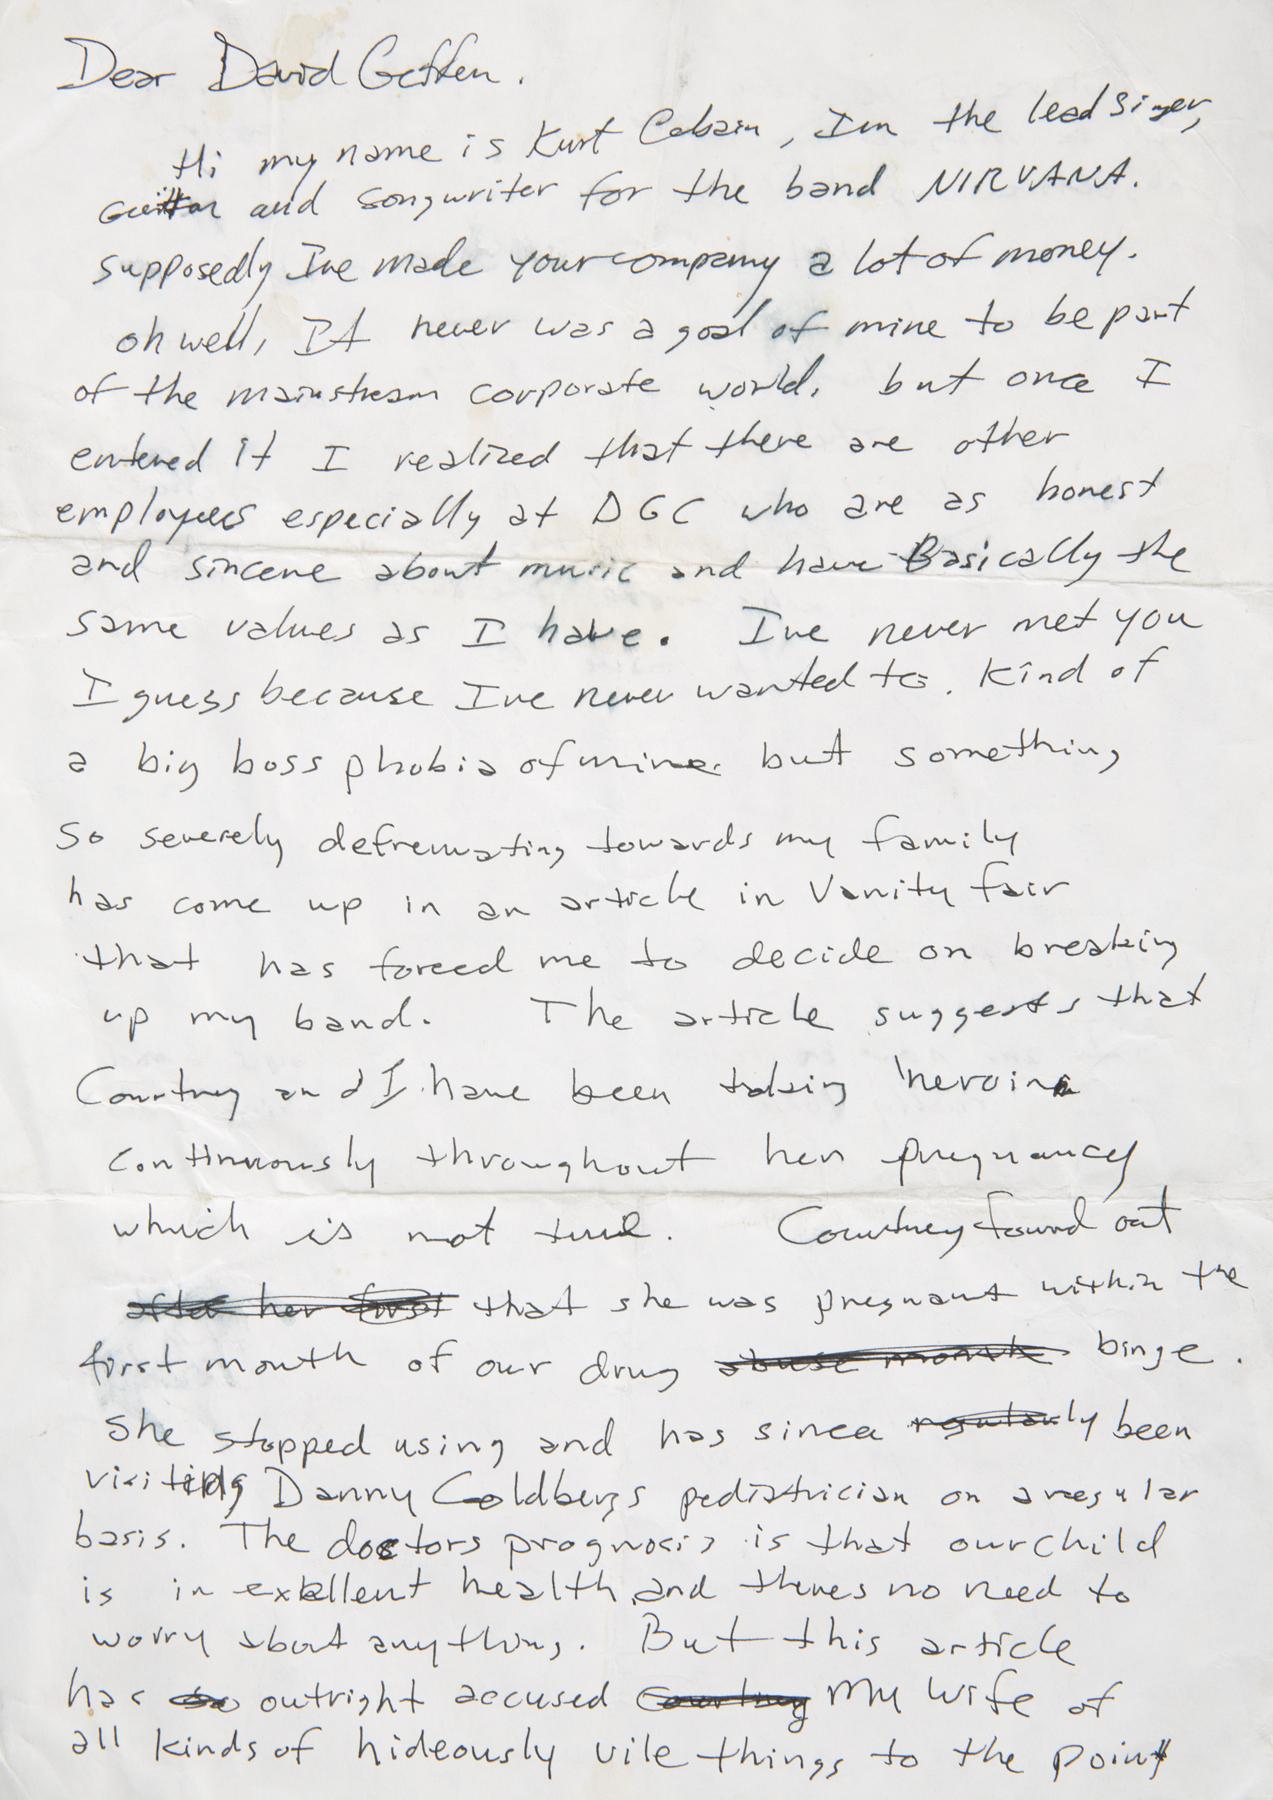 A single sheet two sided handwritten letter by Kurt Cobain